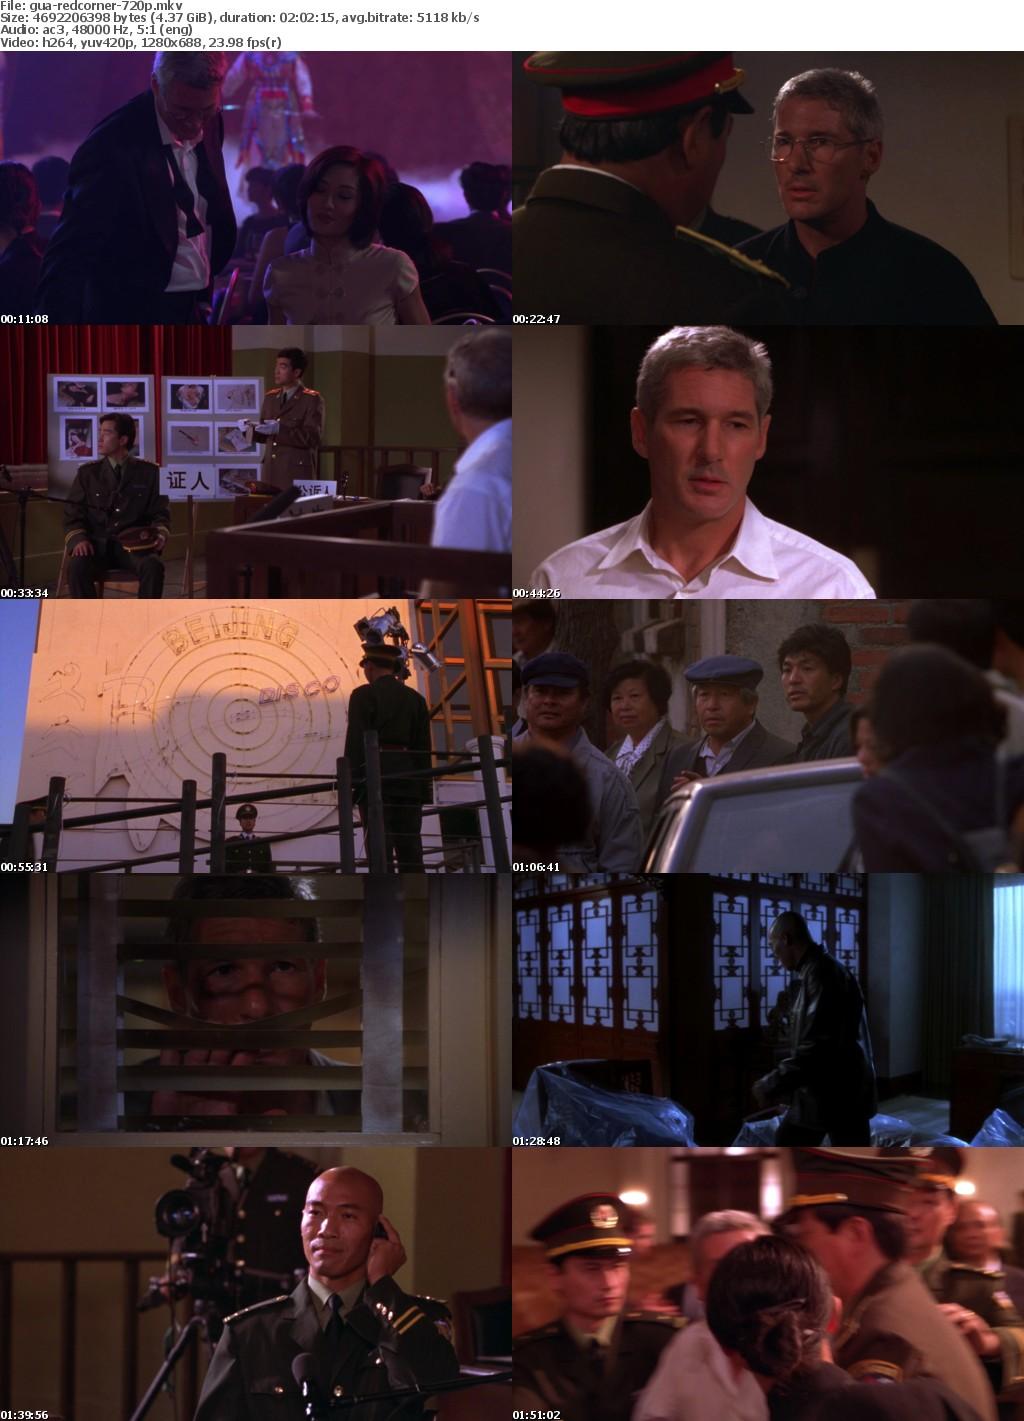 Red Corner (1997) 720p BluRay x264-GUACAMOLErarbg